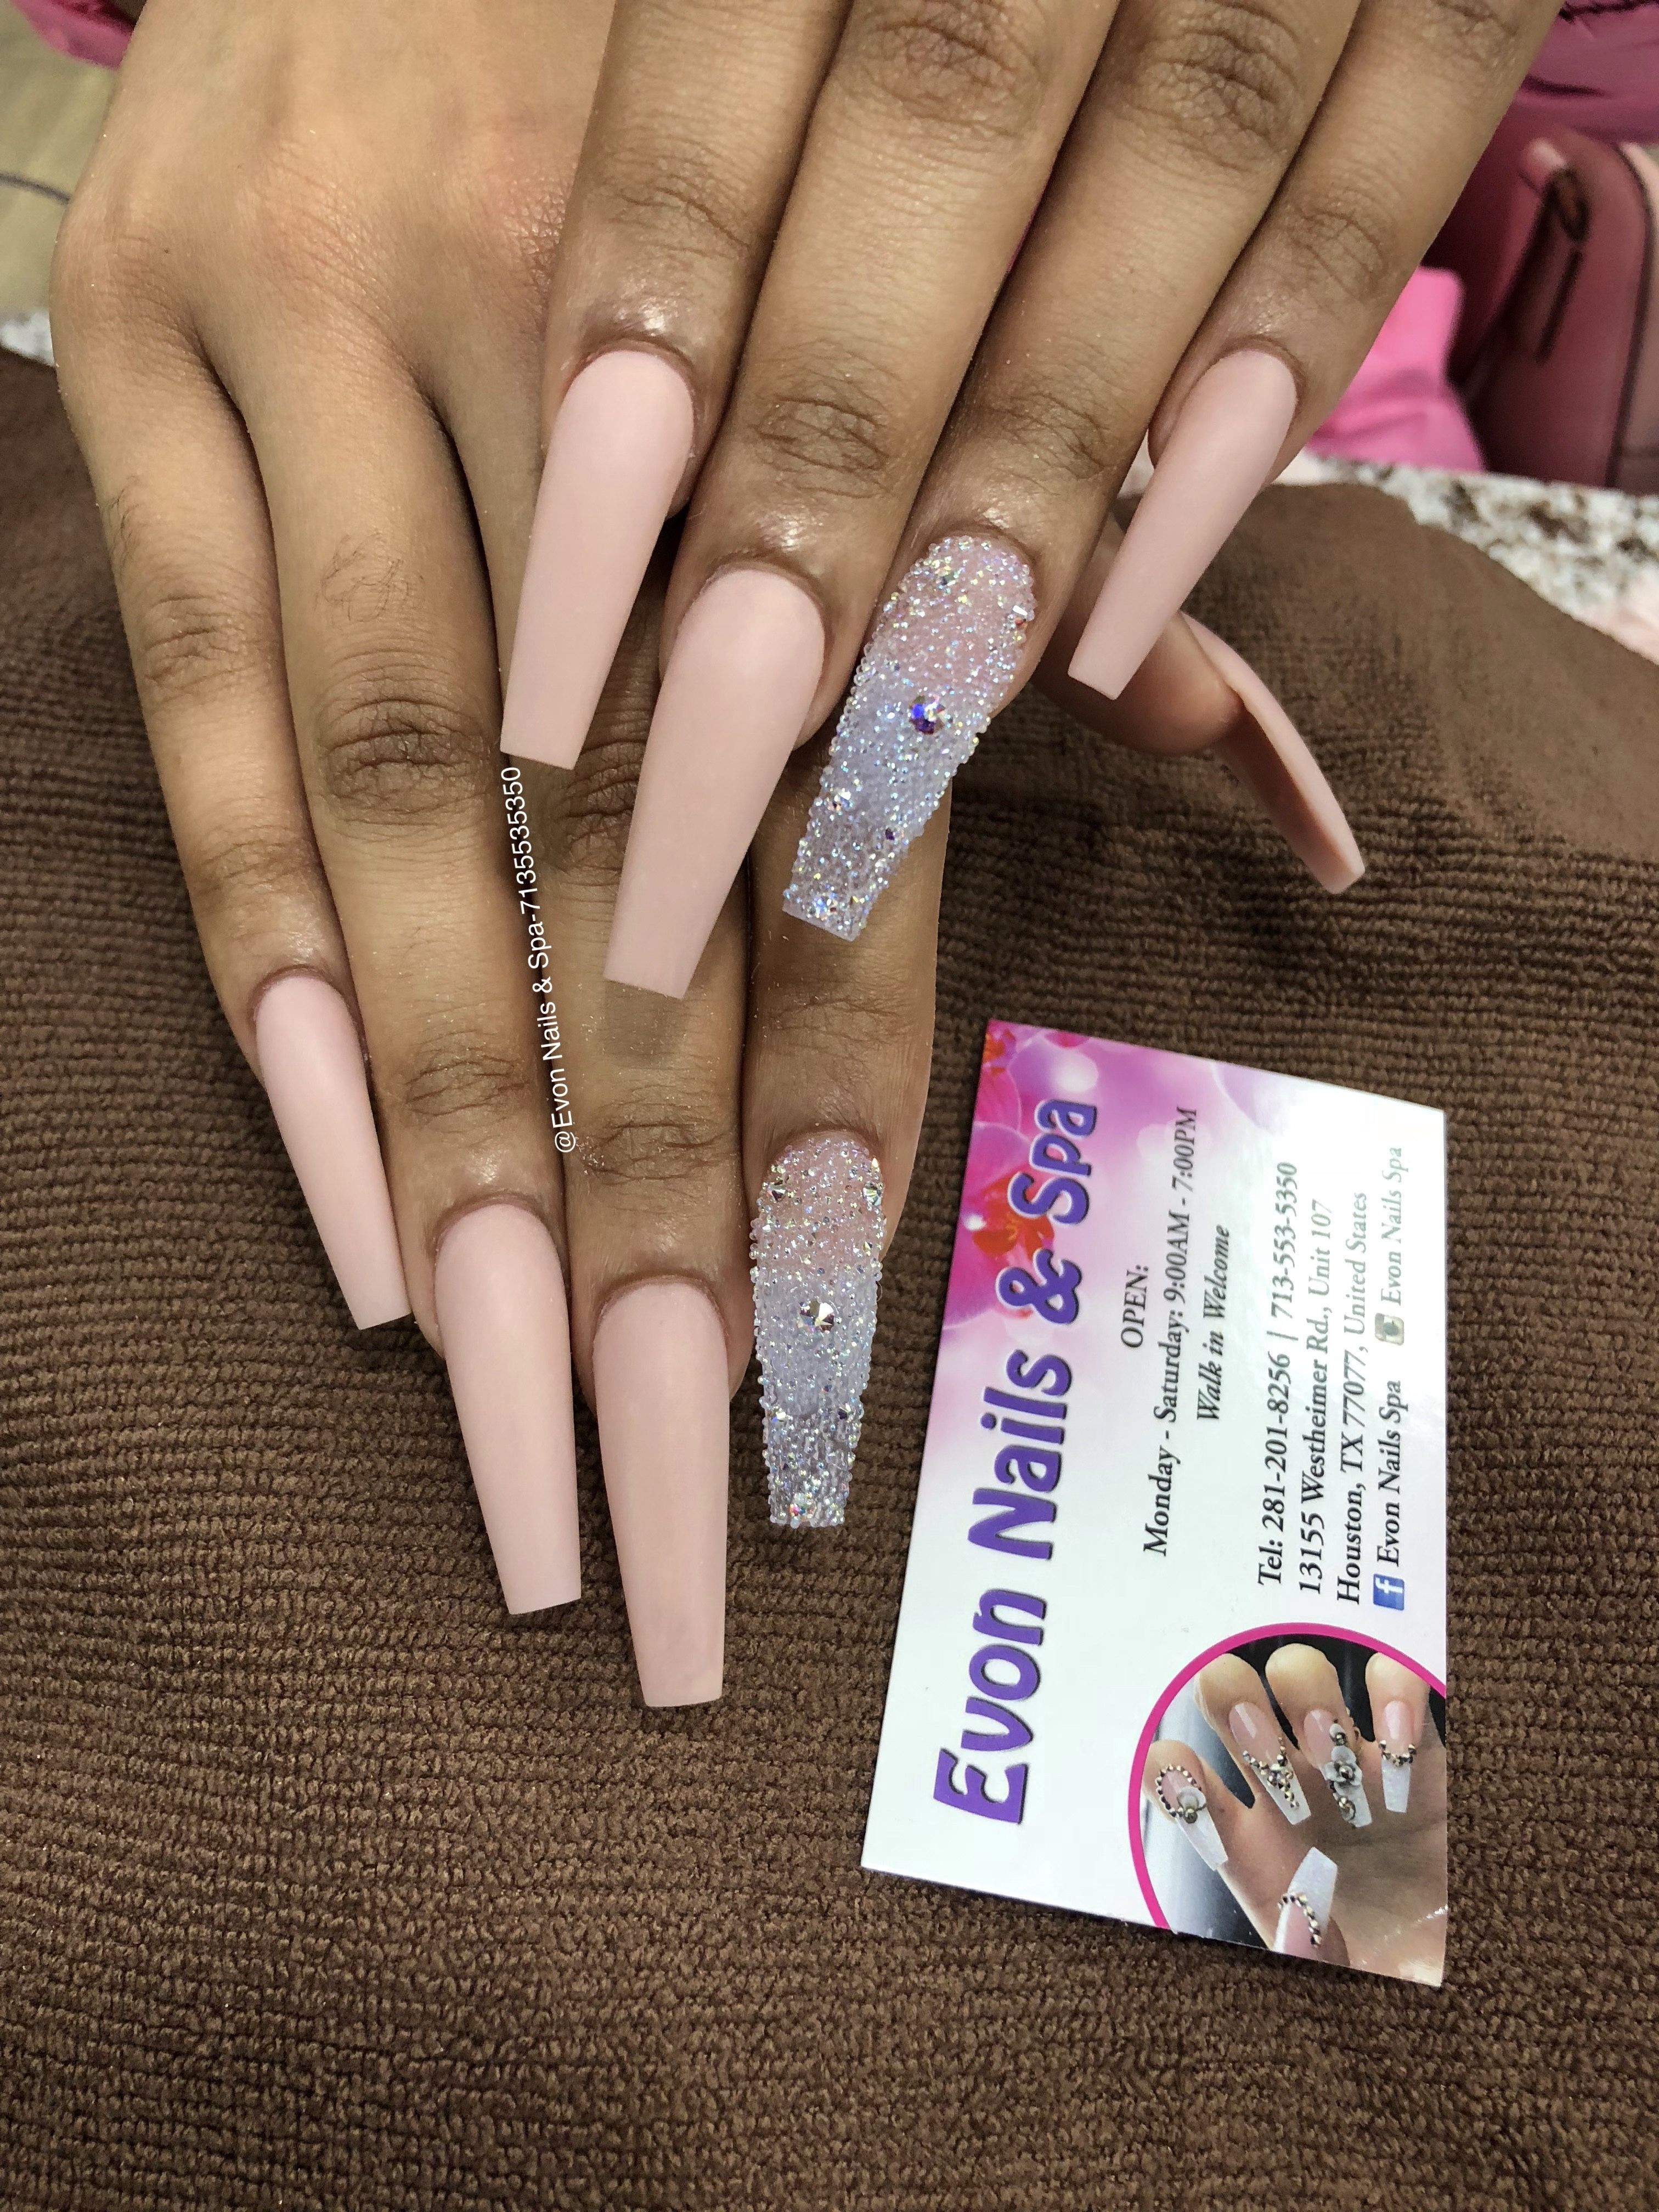 Pin On Evon Nails Spa